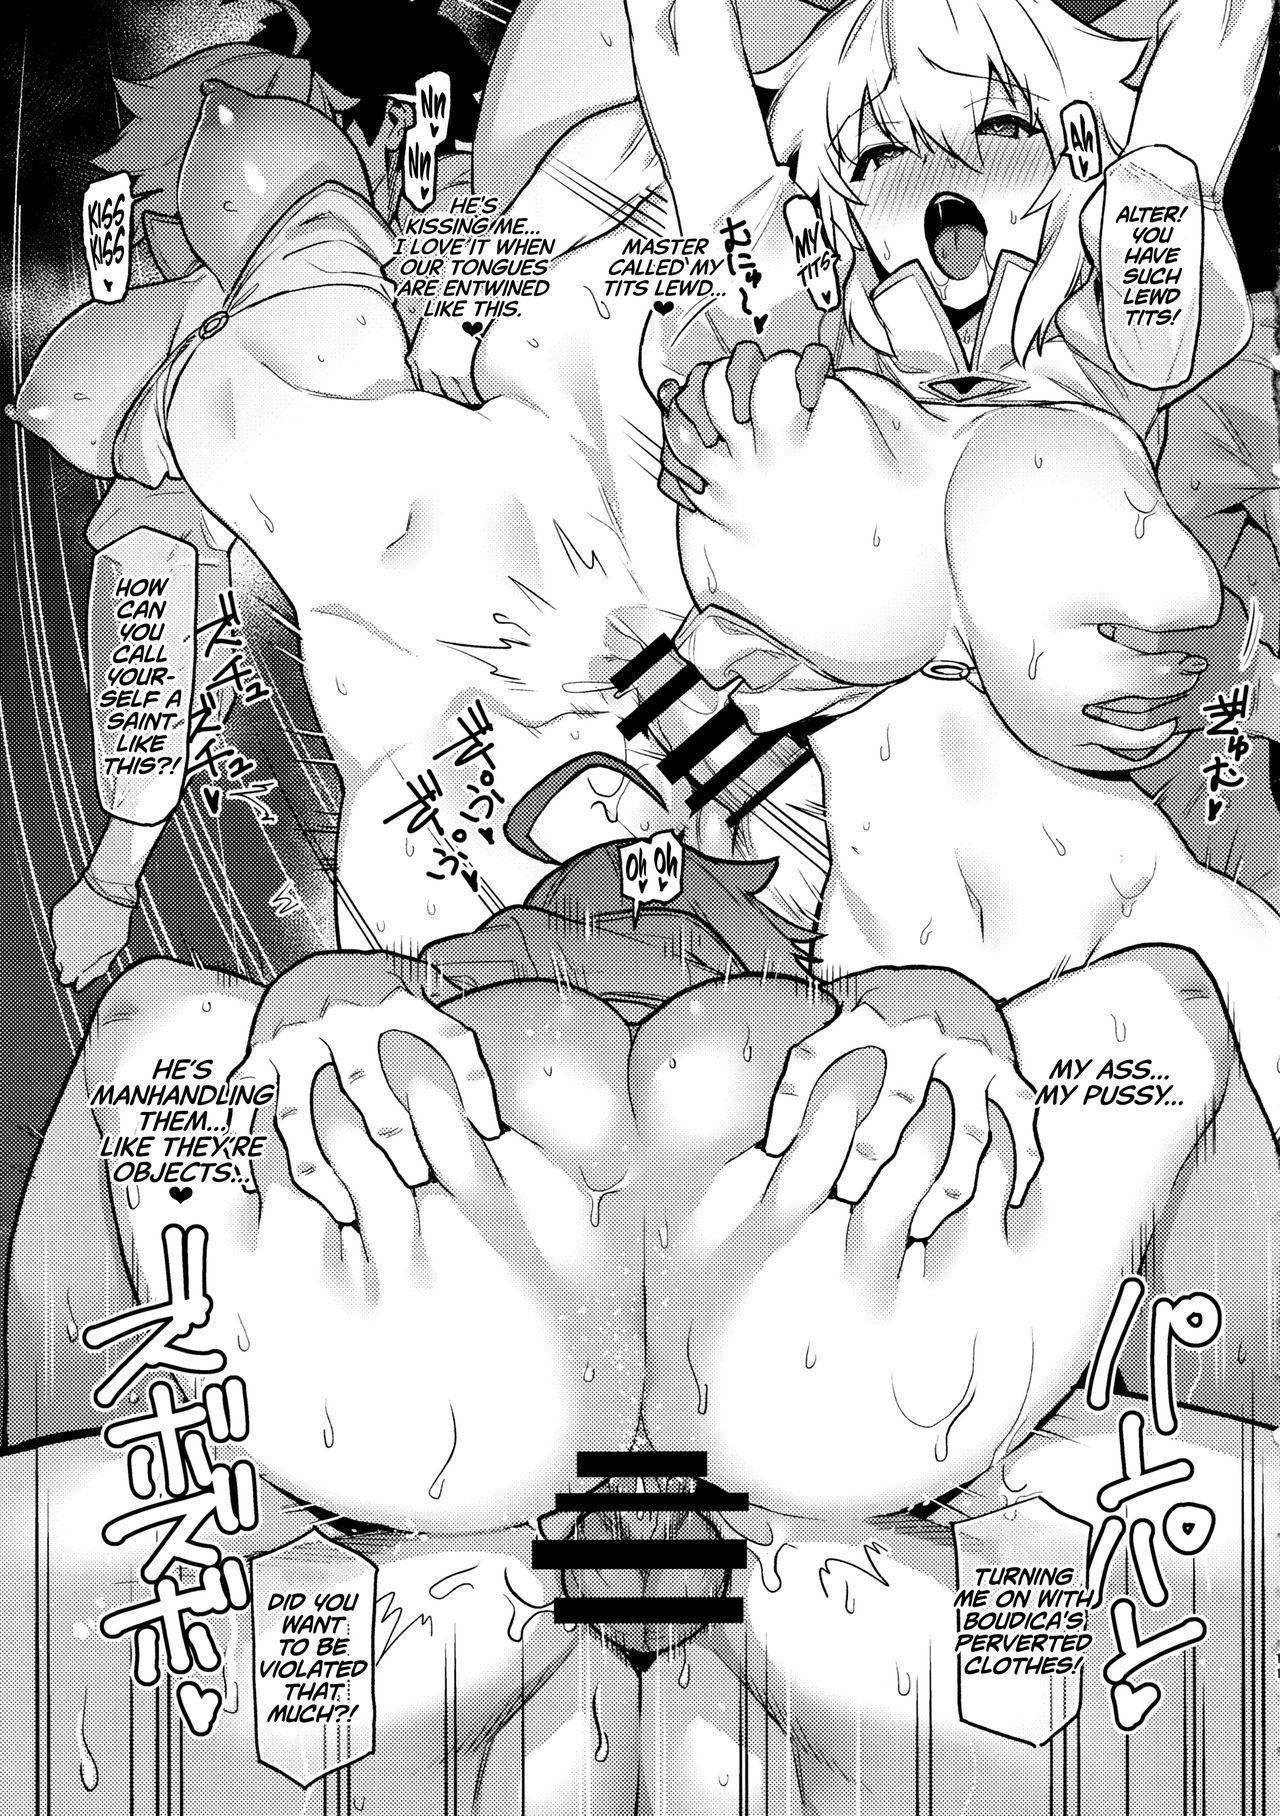 Suki Nandesho? Master wa, Kouiu no ga... | You Like This, Don't You, Master? This Sort Of Thing, I Mean... 9